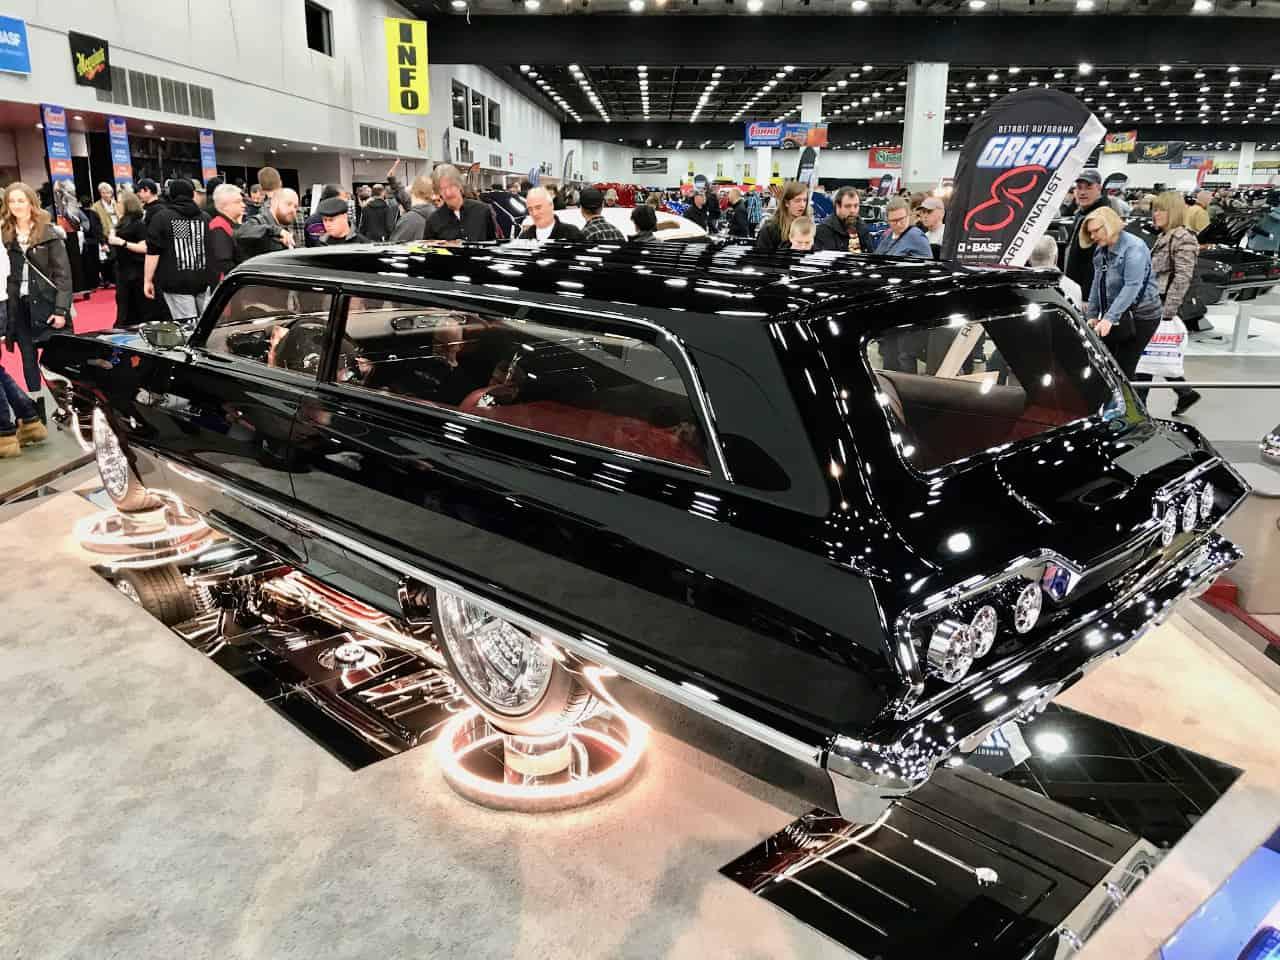 1963 Chevrolet 2-door station wagon on display